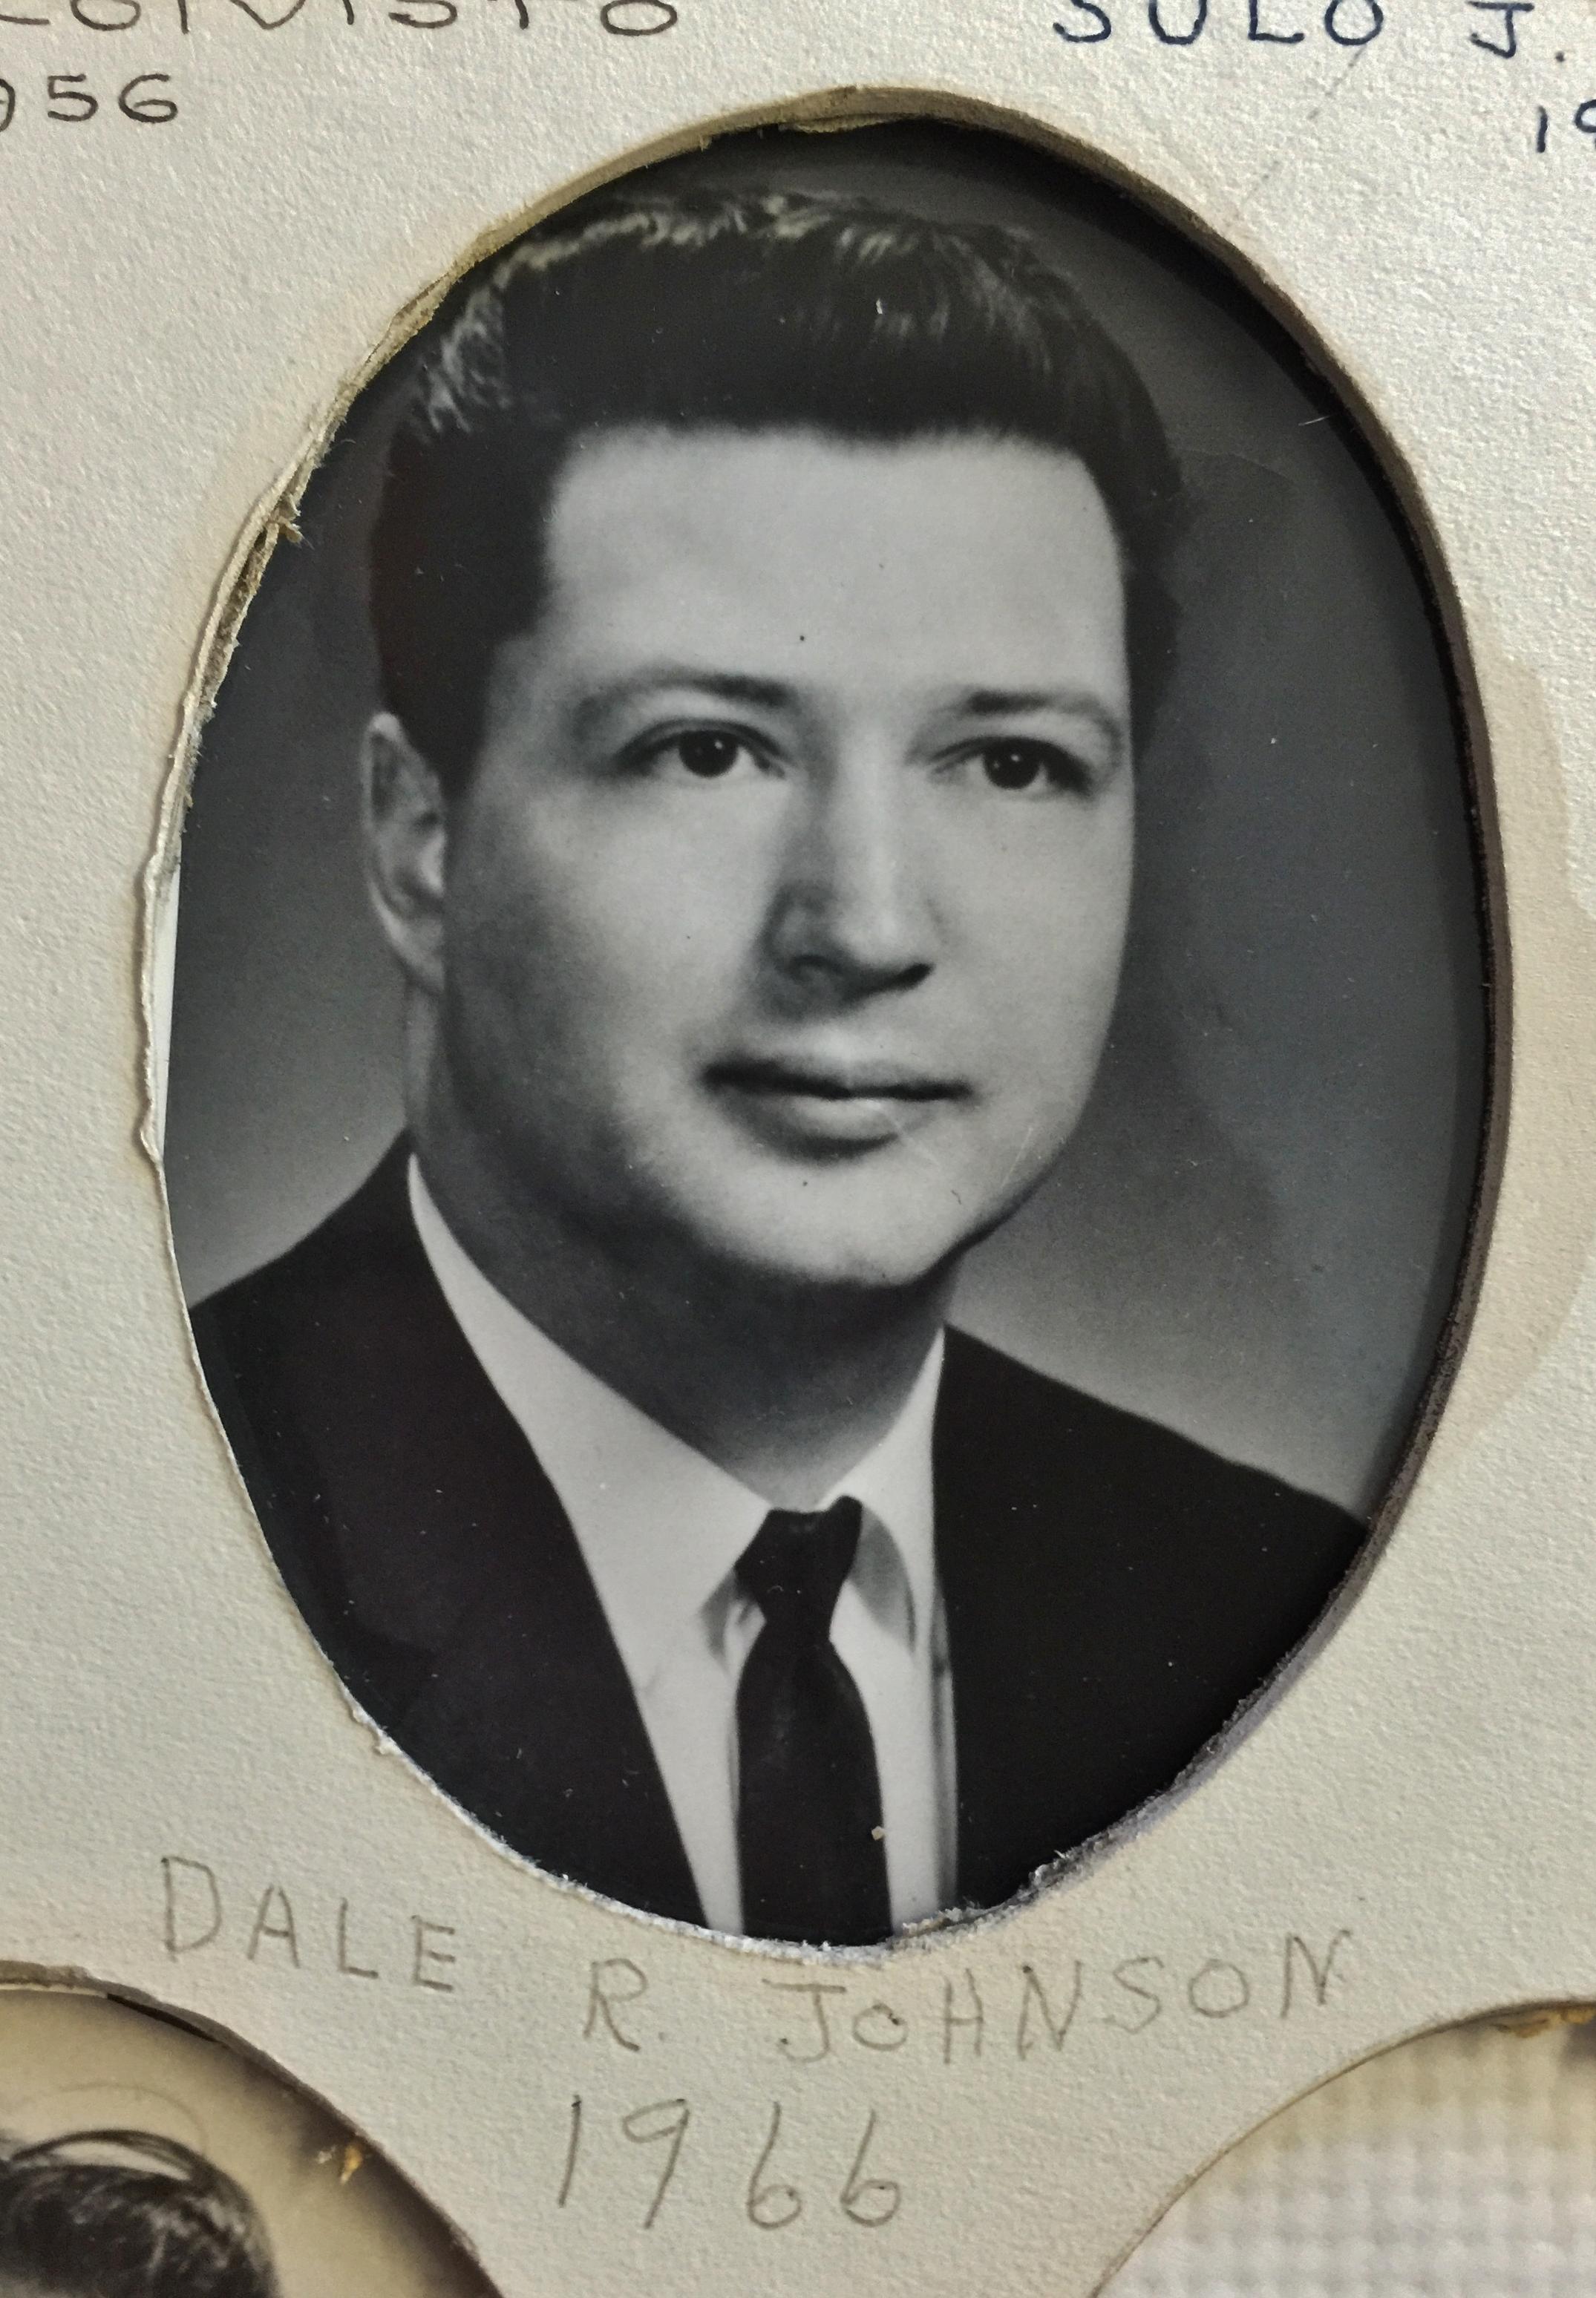 1966 Dale R. Johnson